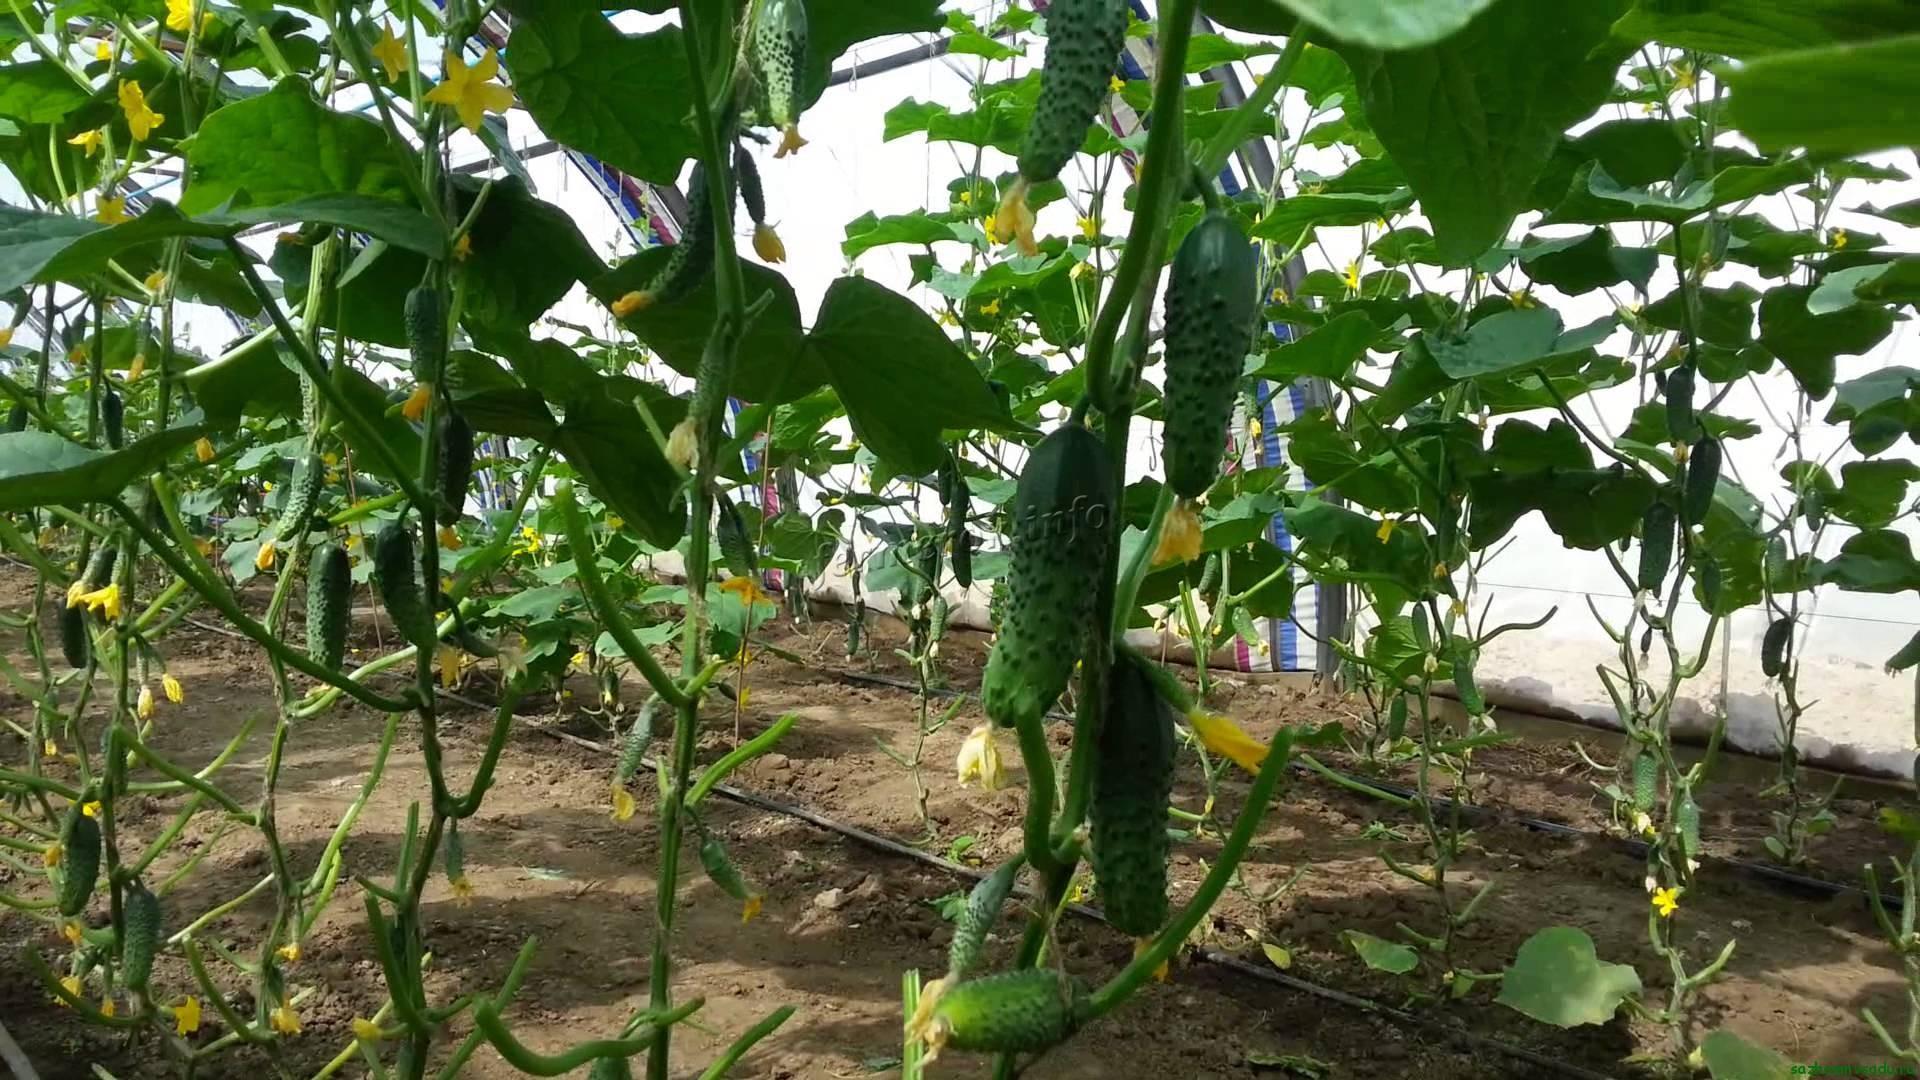 Условия выращивания огурцов в теплице